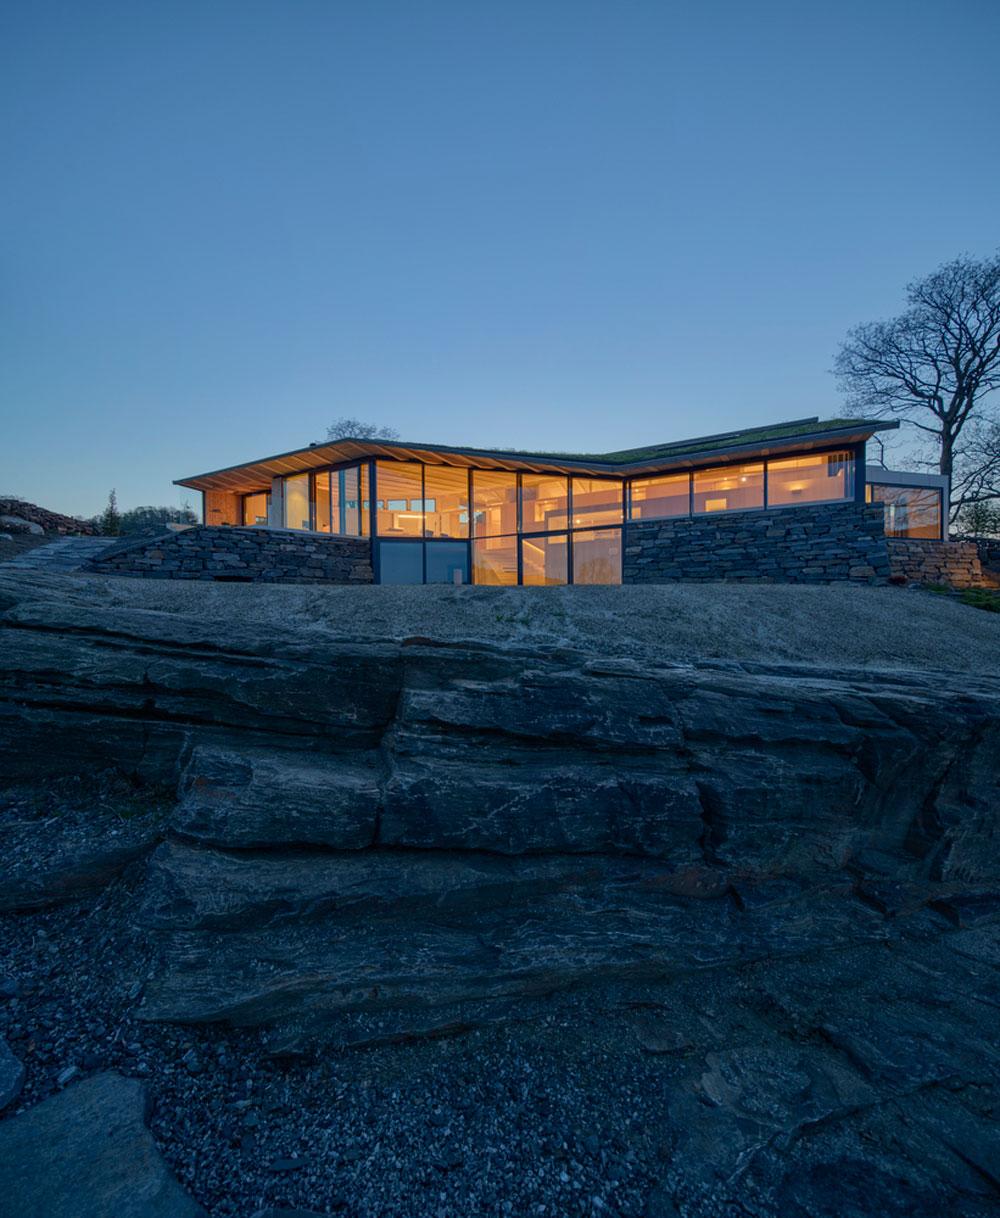 Reilstad-Summerhouse-_-Helen-&-Hard-Visual-Atelier-8-Architecture-14.jpg